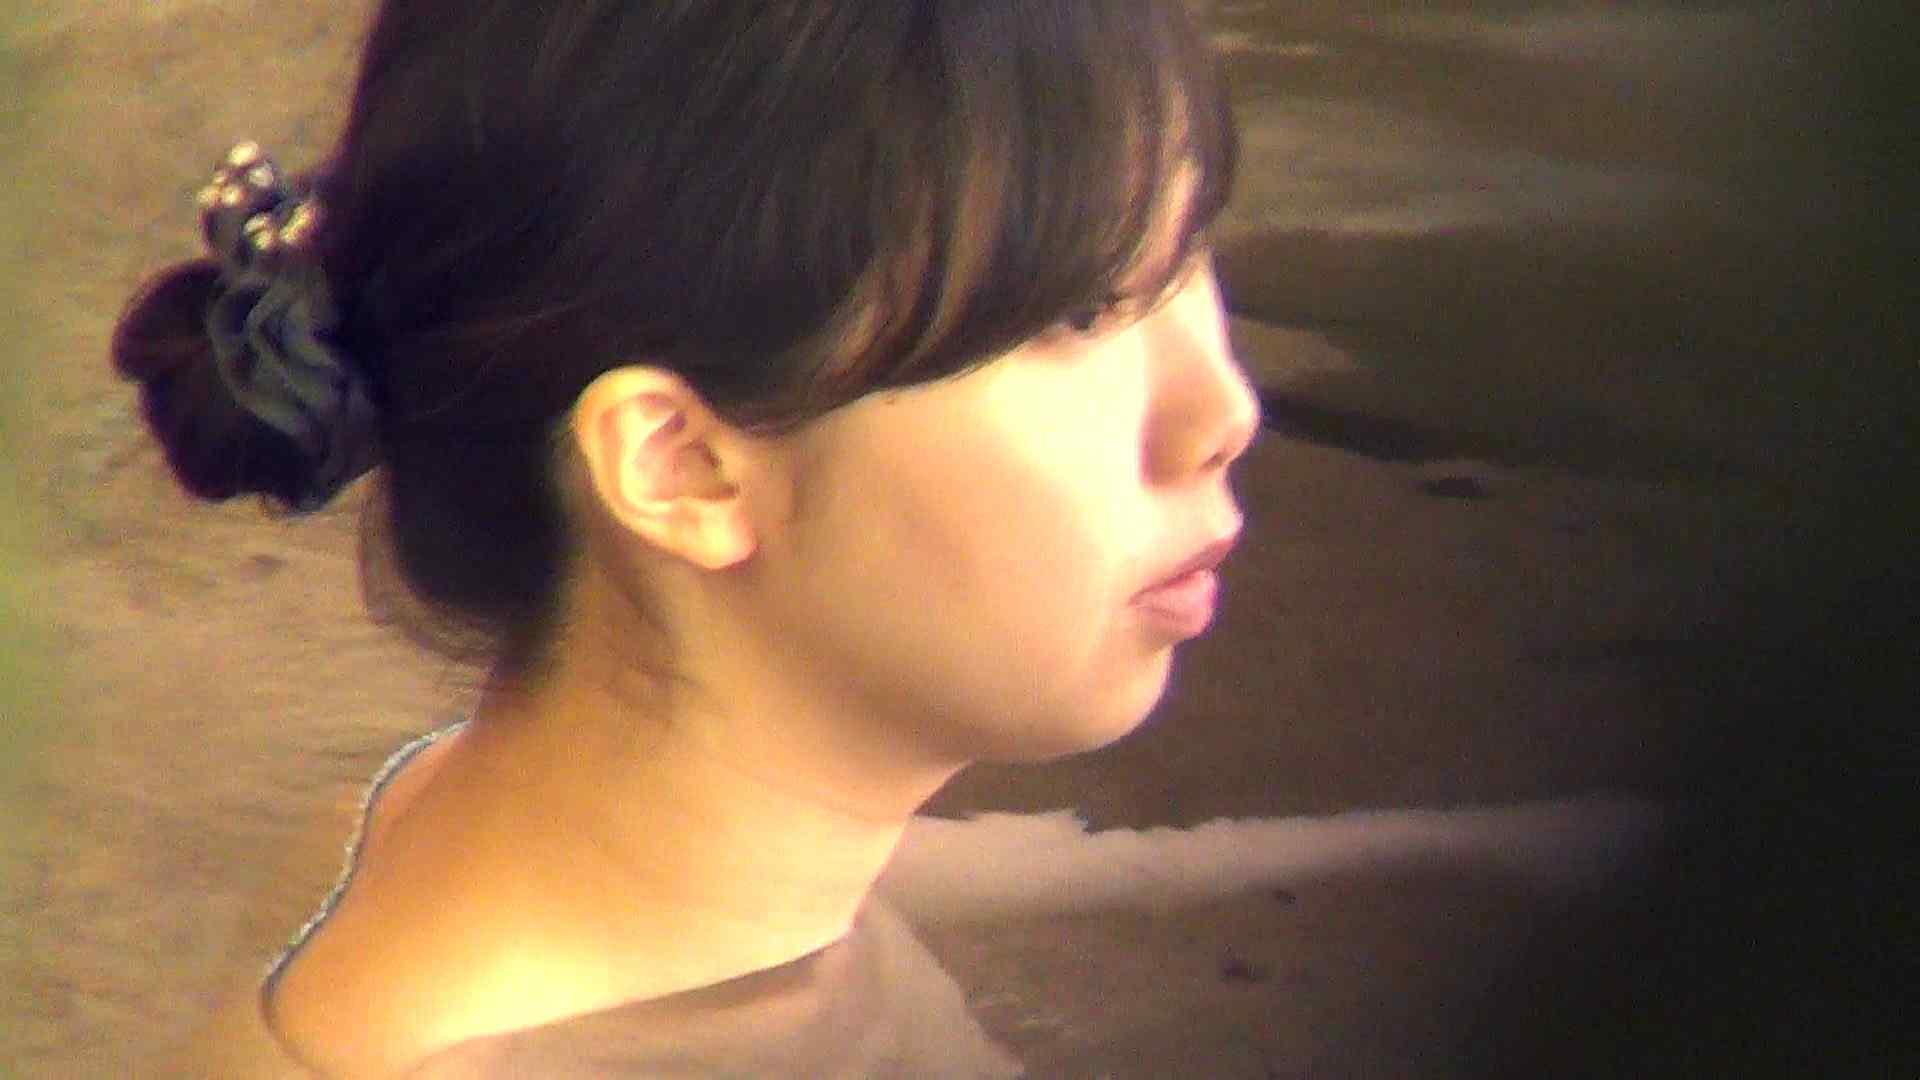 Aquaな露天風呂Vol.285 盗撮シリーズ | 露天風呂編  106PIX 17